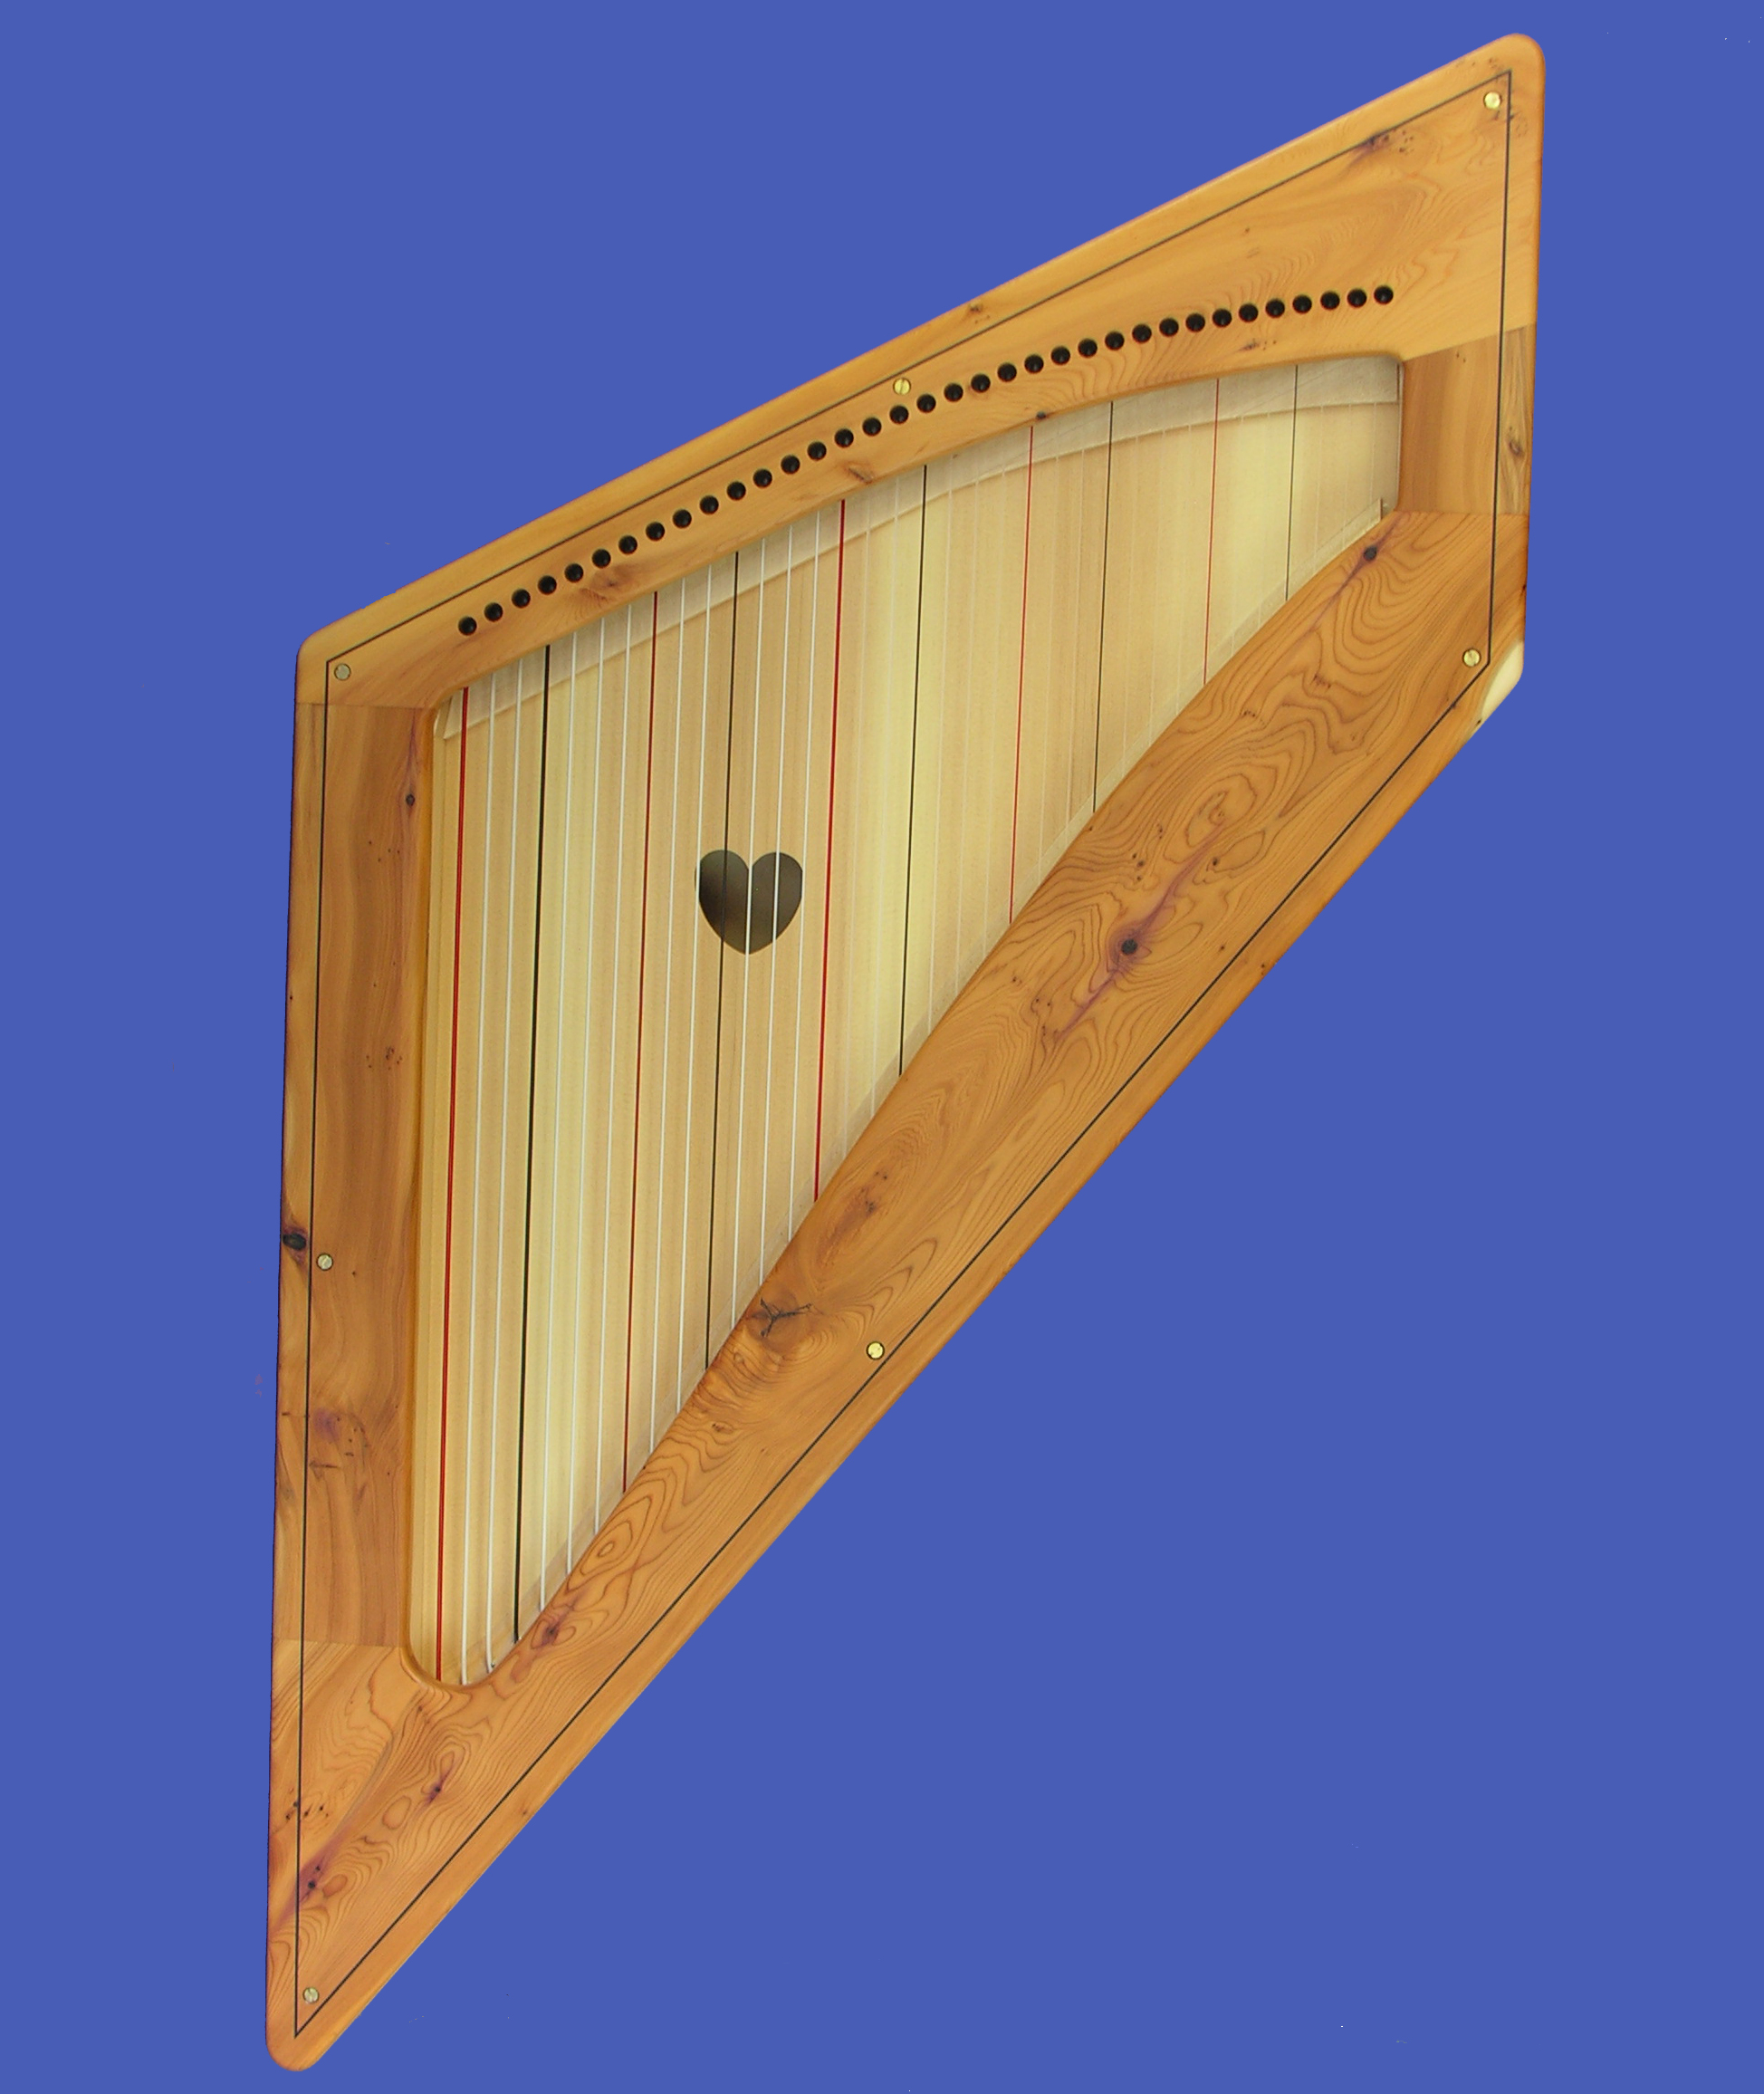 Niche Harp with Yew Wood Facing